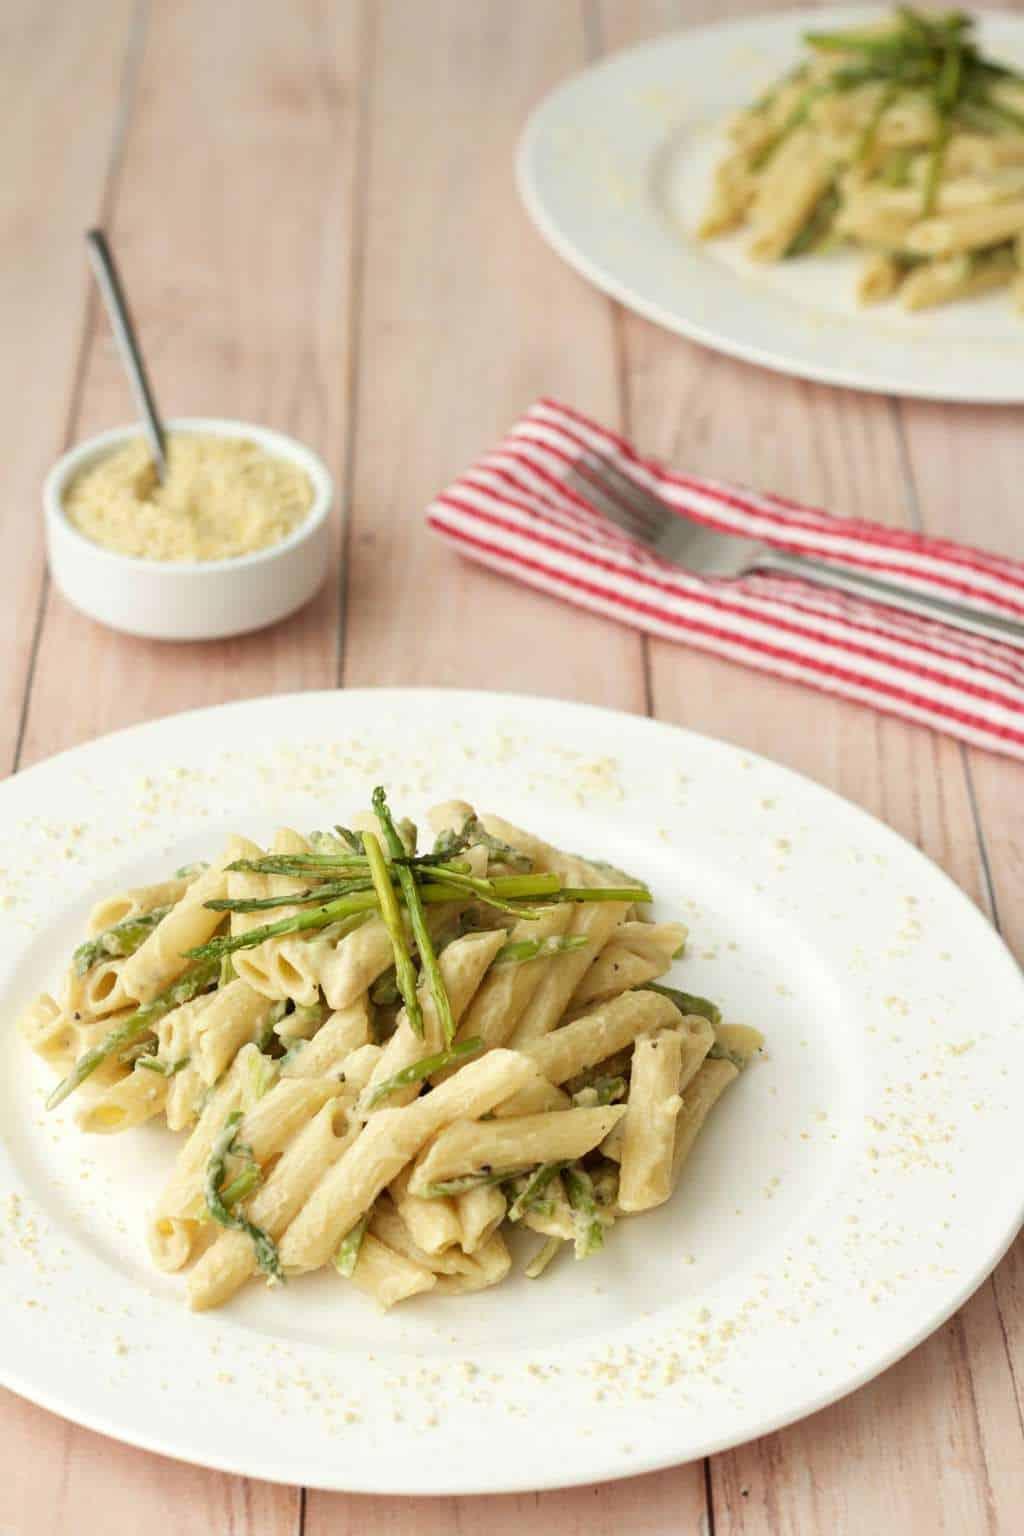 Creamy Asparagus Pasta #vegan #lovingitvegan #dairyfree #pasta #entree